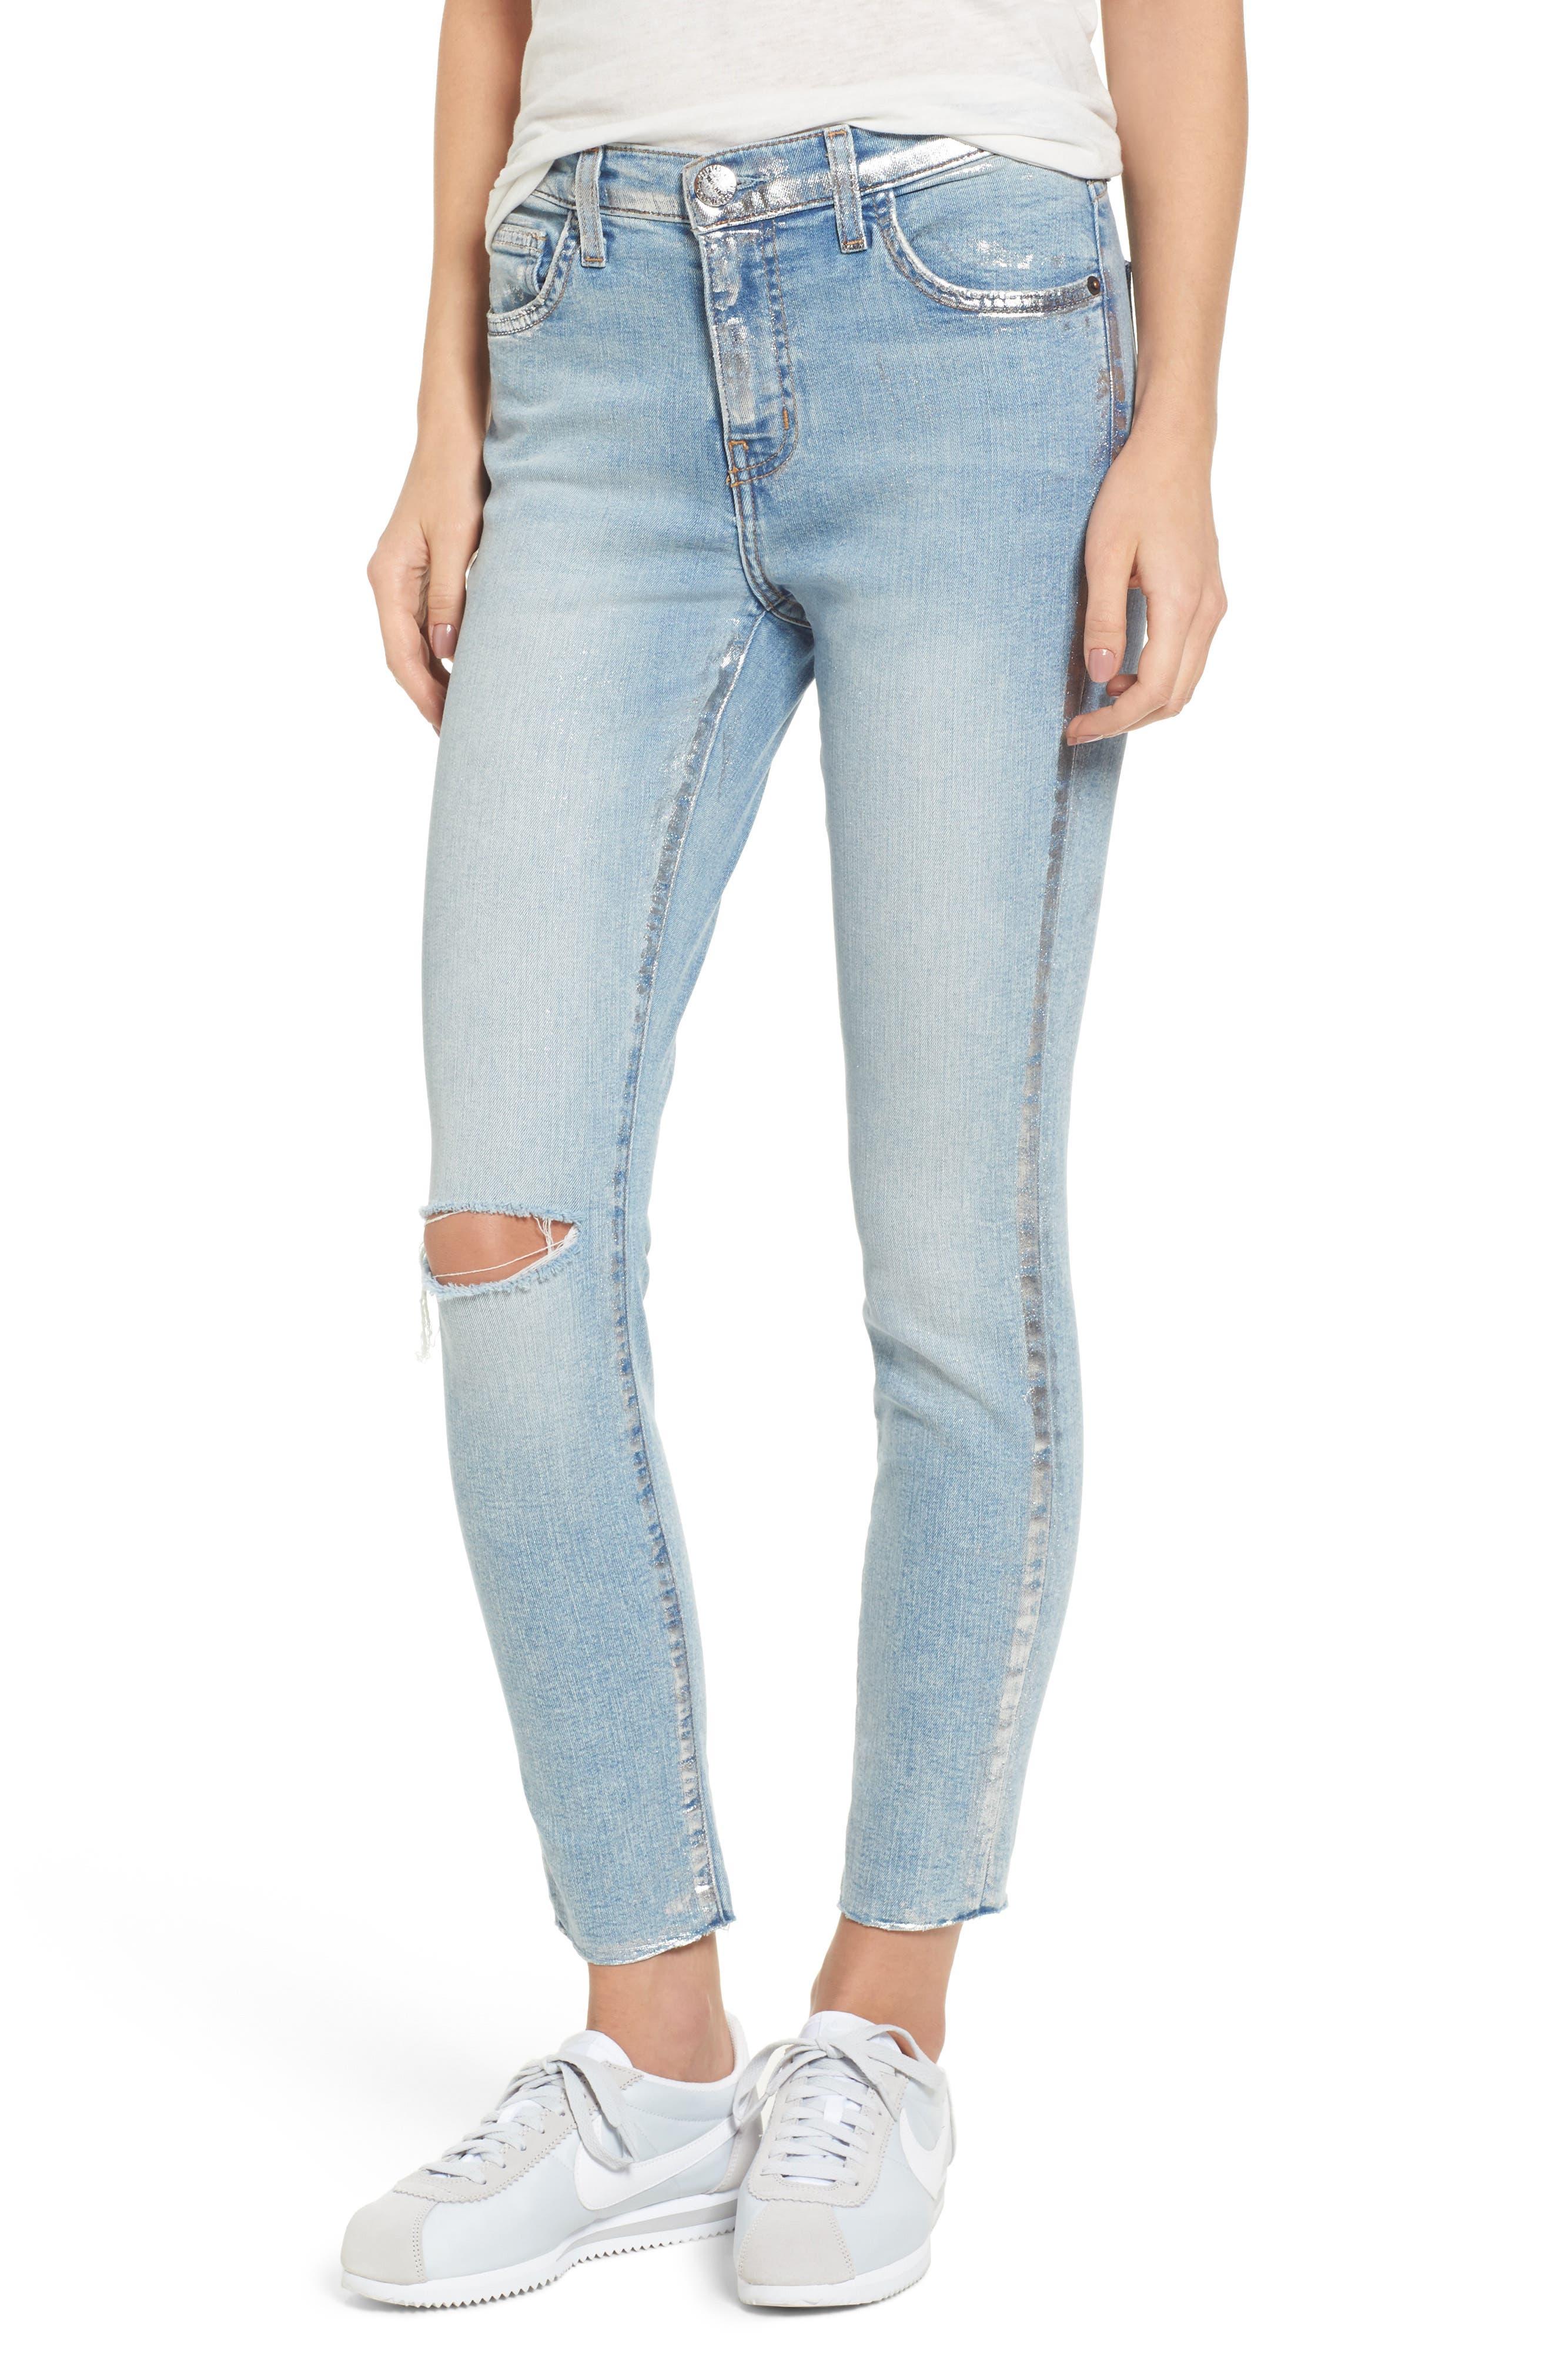 The Stiletto High Waist Skinny Jeans,                         Main,                         color, Seville Destroy/ Foil